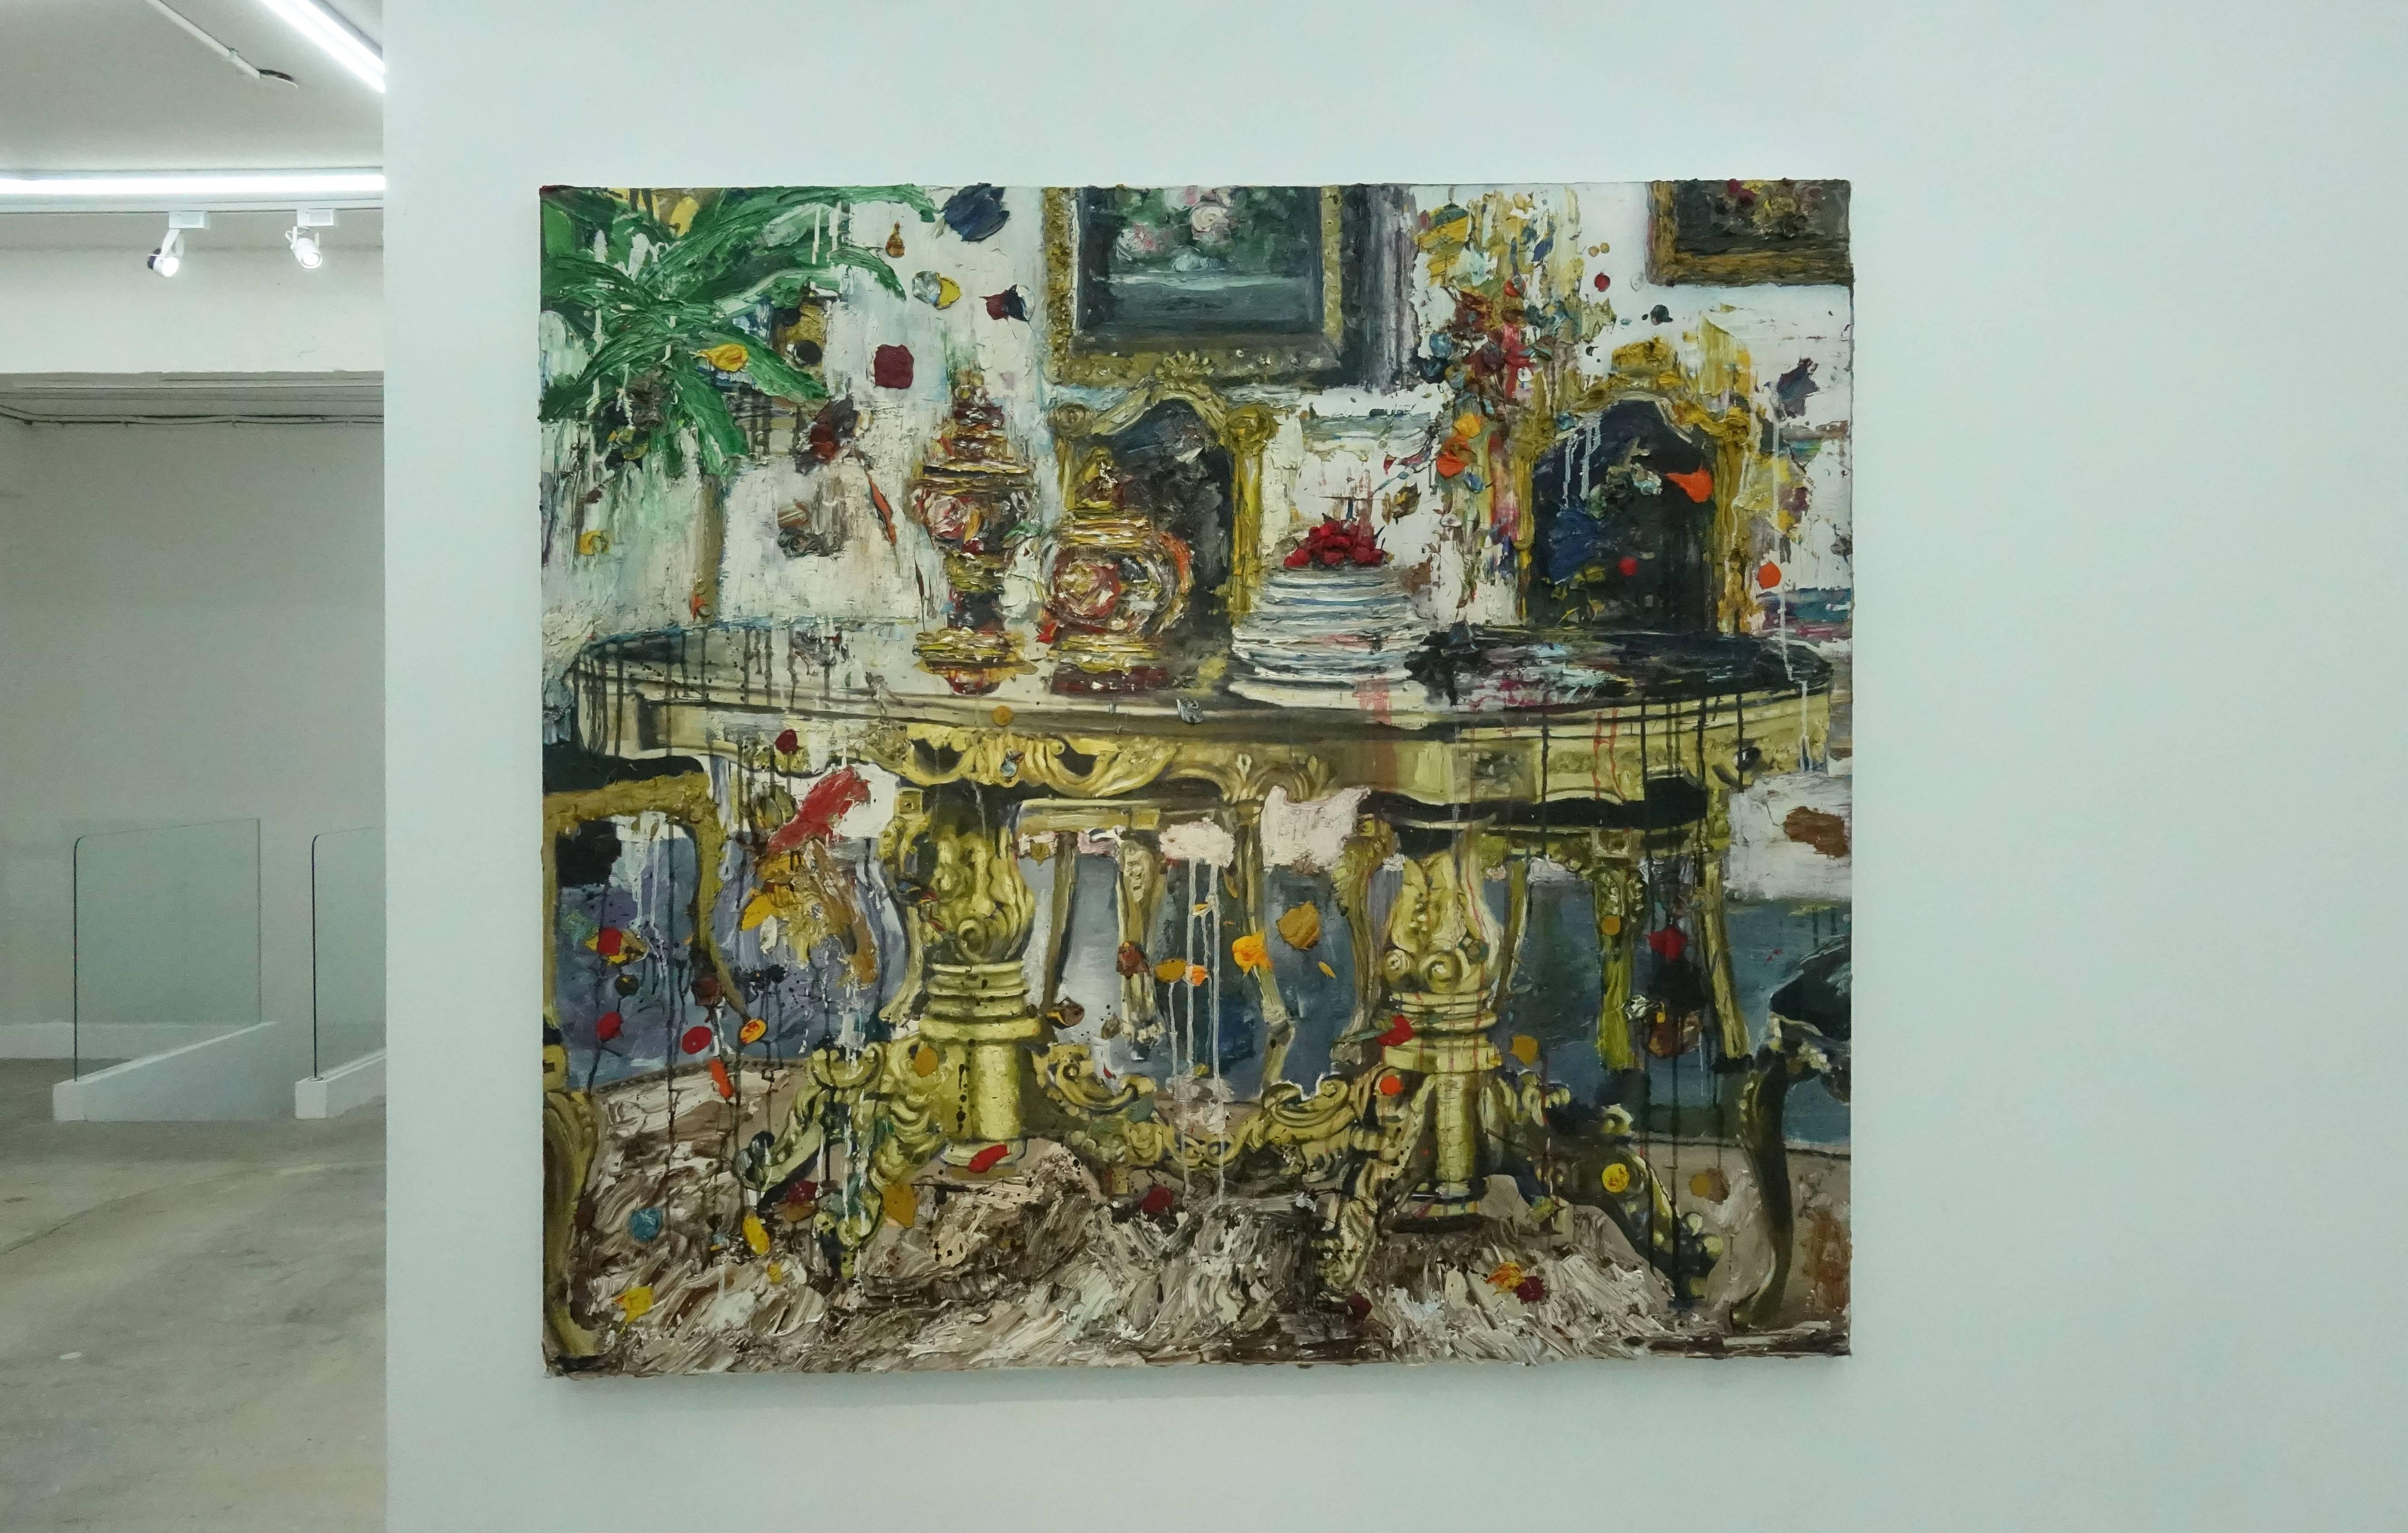 喬瑟夫・特克松(Joseph Tecson),《舞會一隅 III Interior After Party III》,油畫畫布,2018。